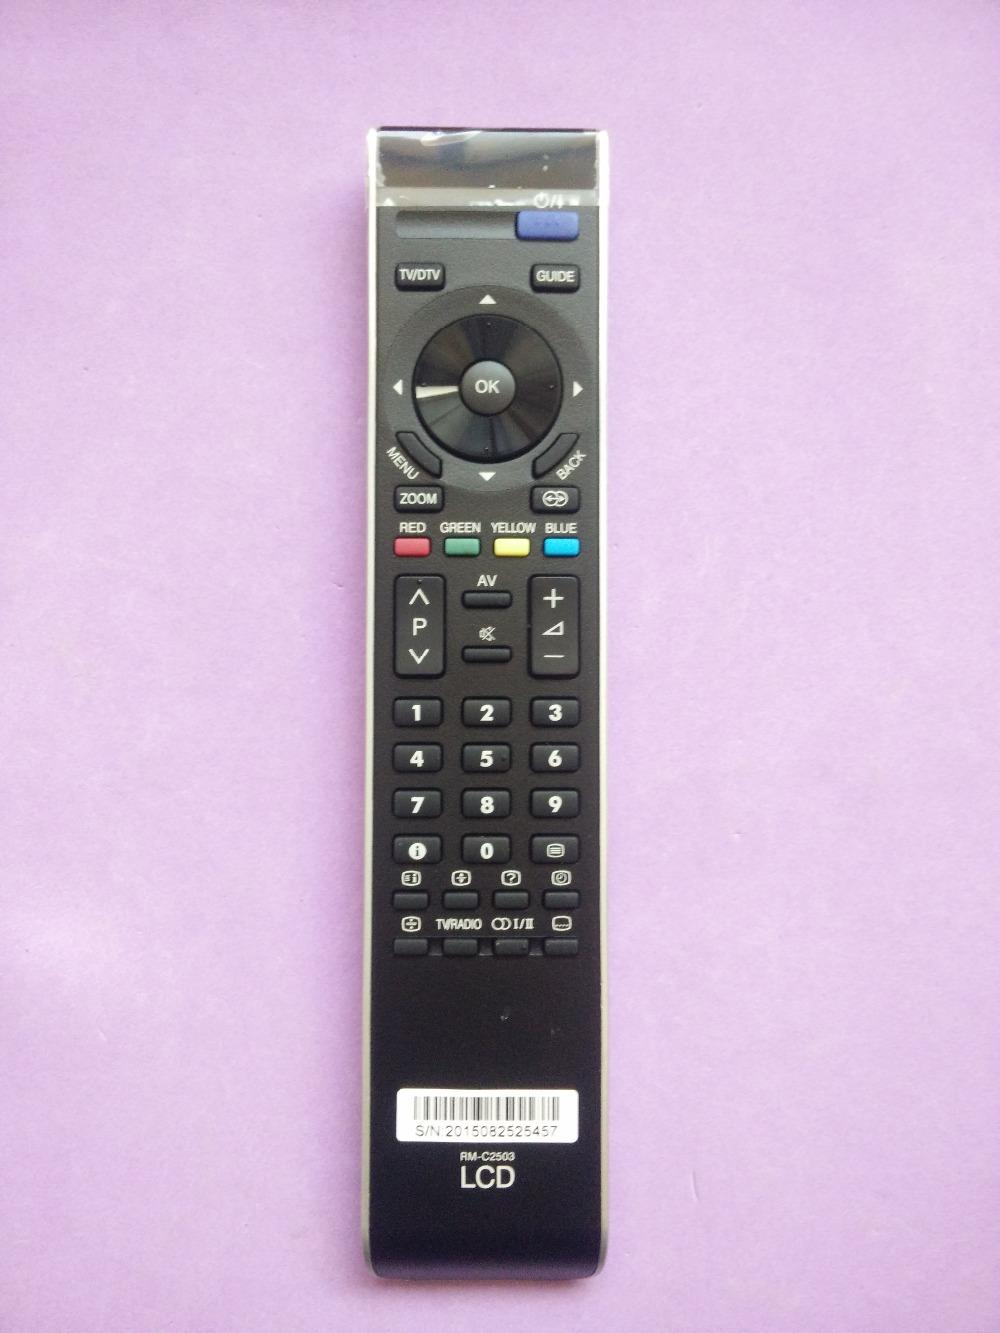 New Original For JVC RM-C2503 LCD TV Remote Control for JVC LT-32DB1BU LT-32DB1BU/AX(China (Mainland))